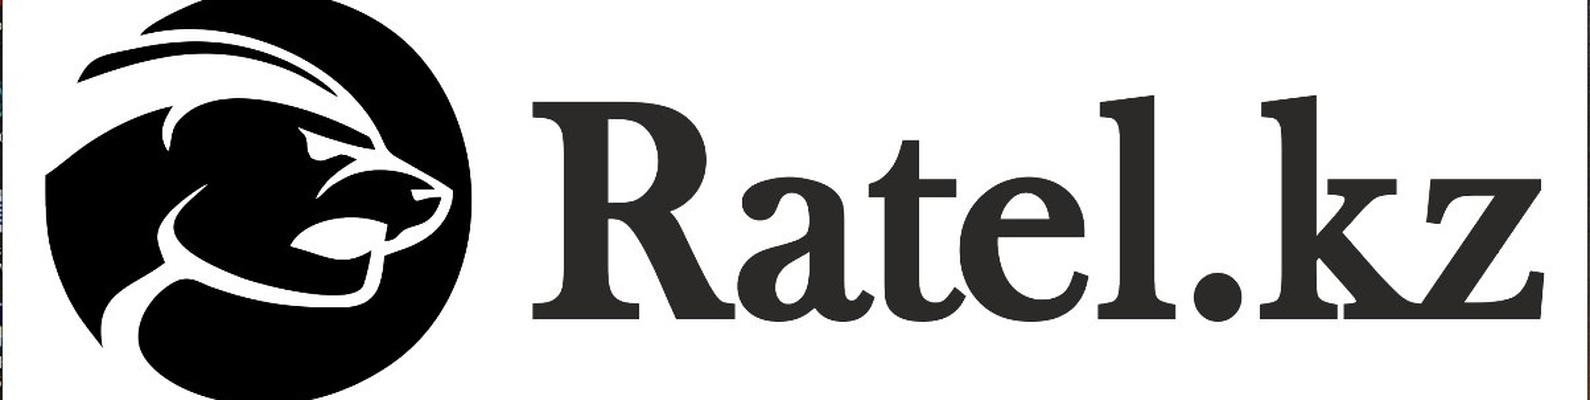 Новости Казахстана Ratel.kz | ВКонтакте